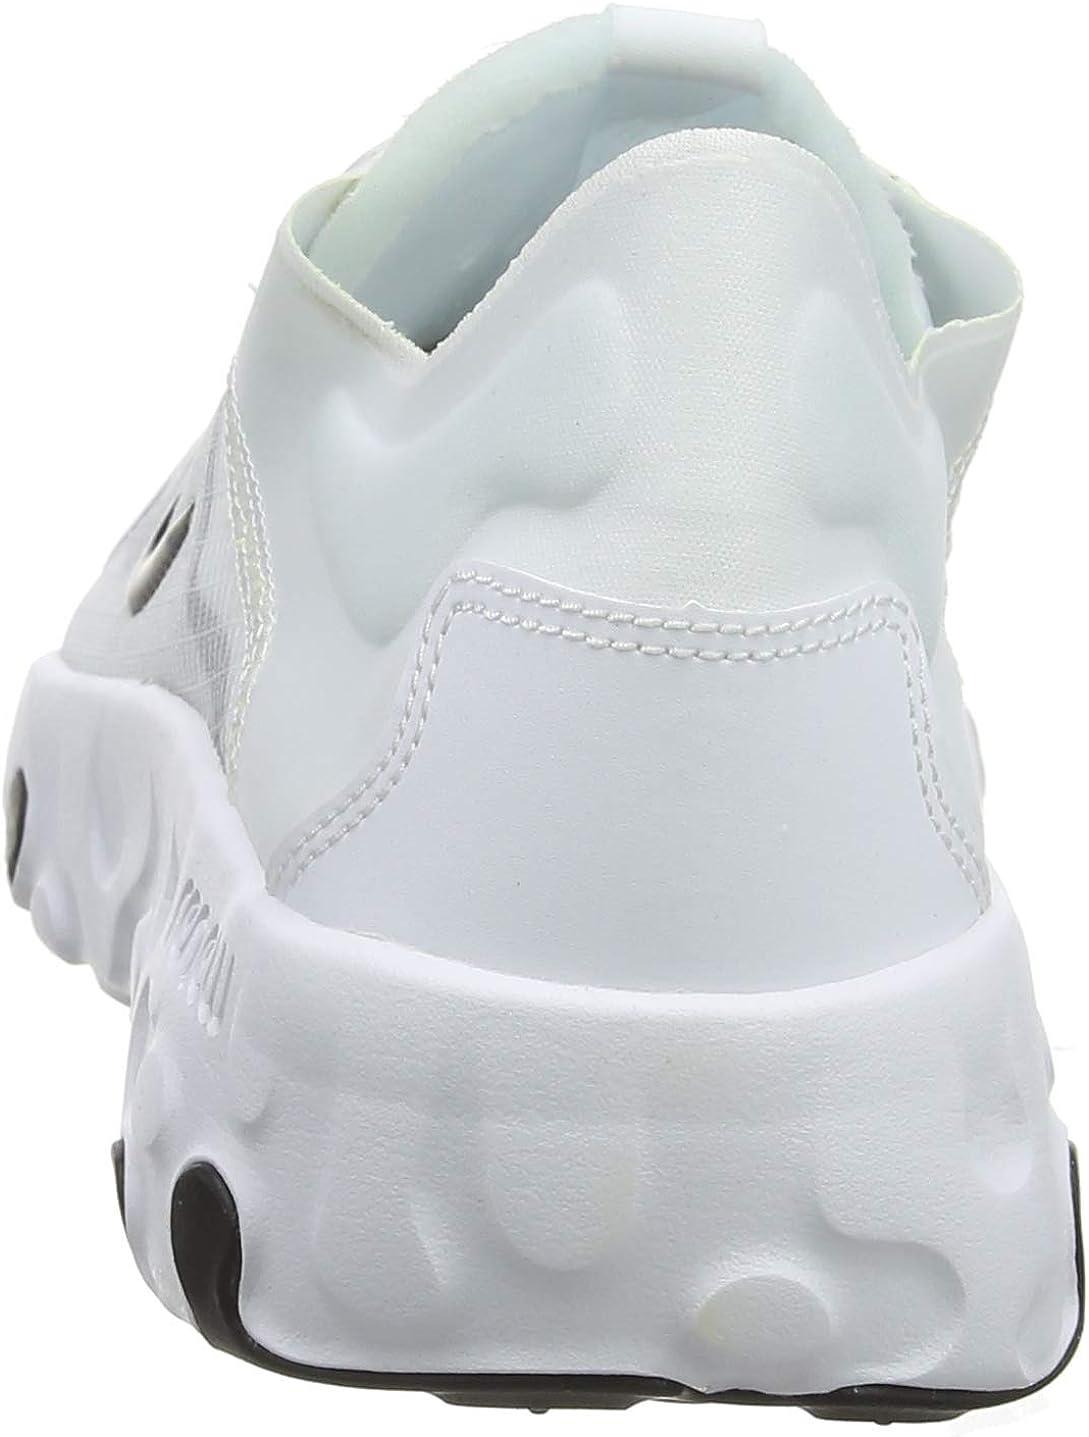 Nike Herren Renew Lucent Sneaker, Schwarz, 45 EU Weiß White Black 100